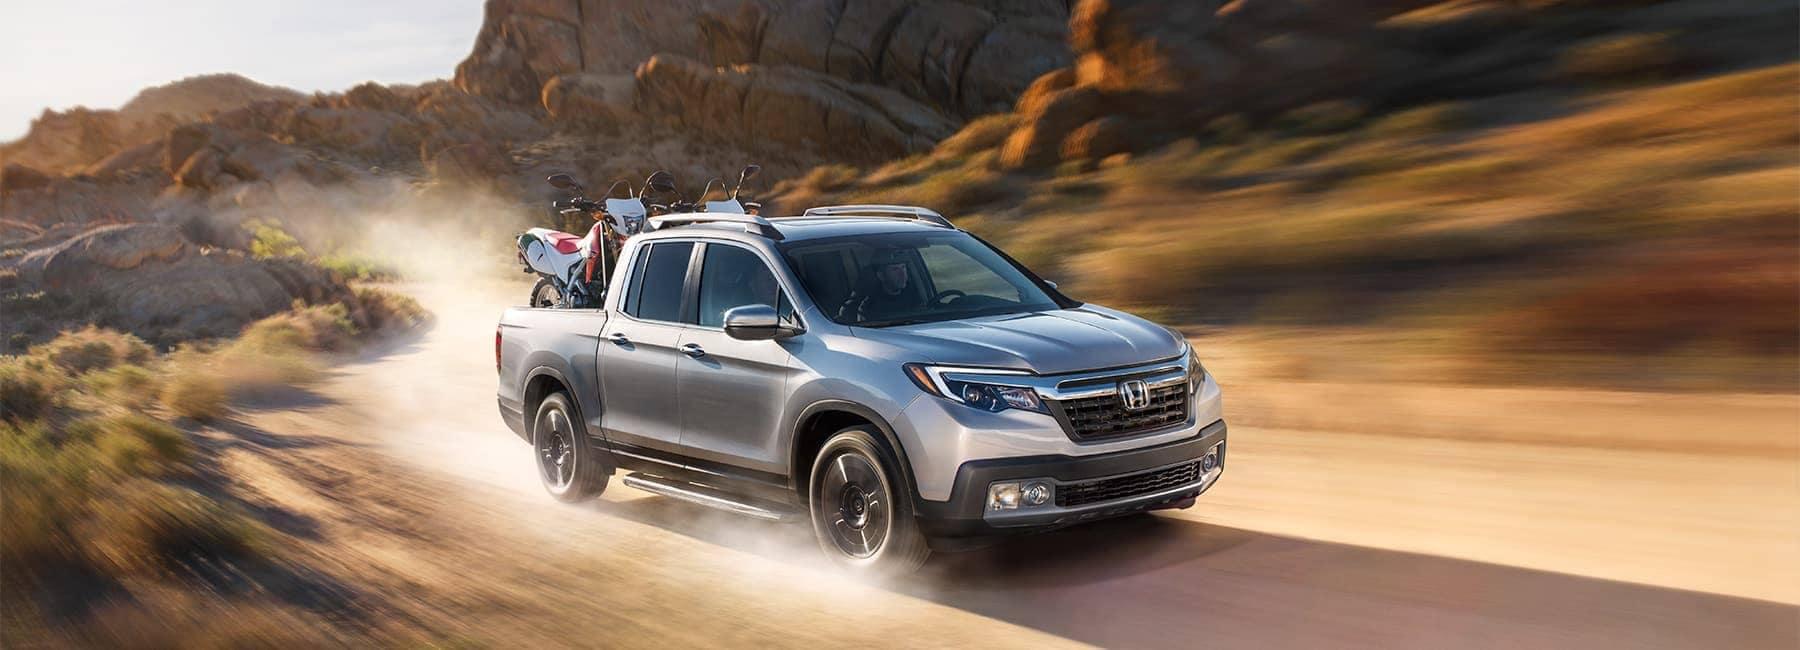 2020-honda-ridgeline-driving on dirt road